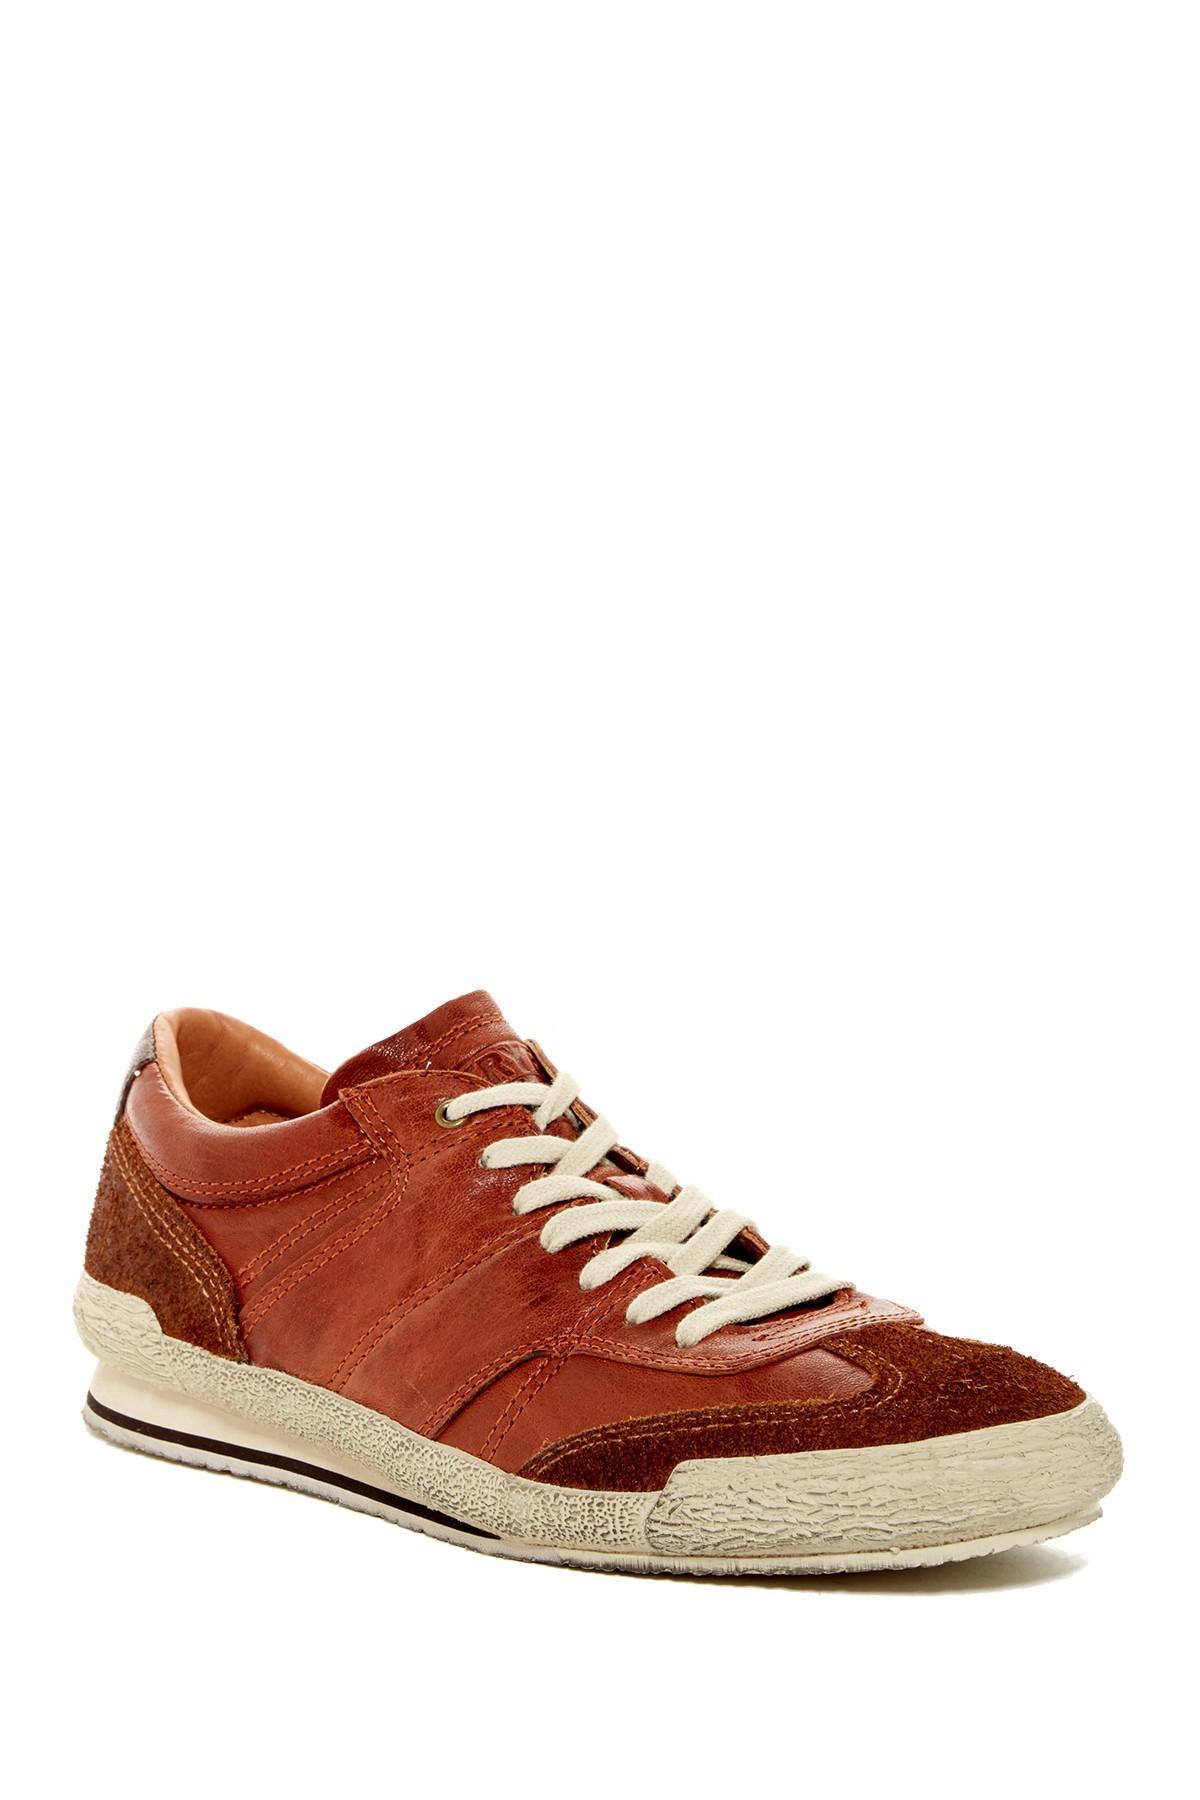 Lyst Frye Snyder Runner Sneaker In Brown For Men